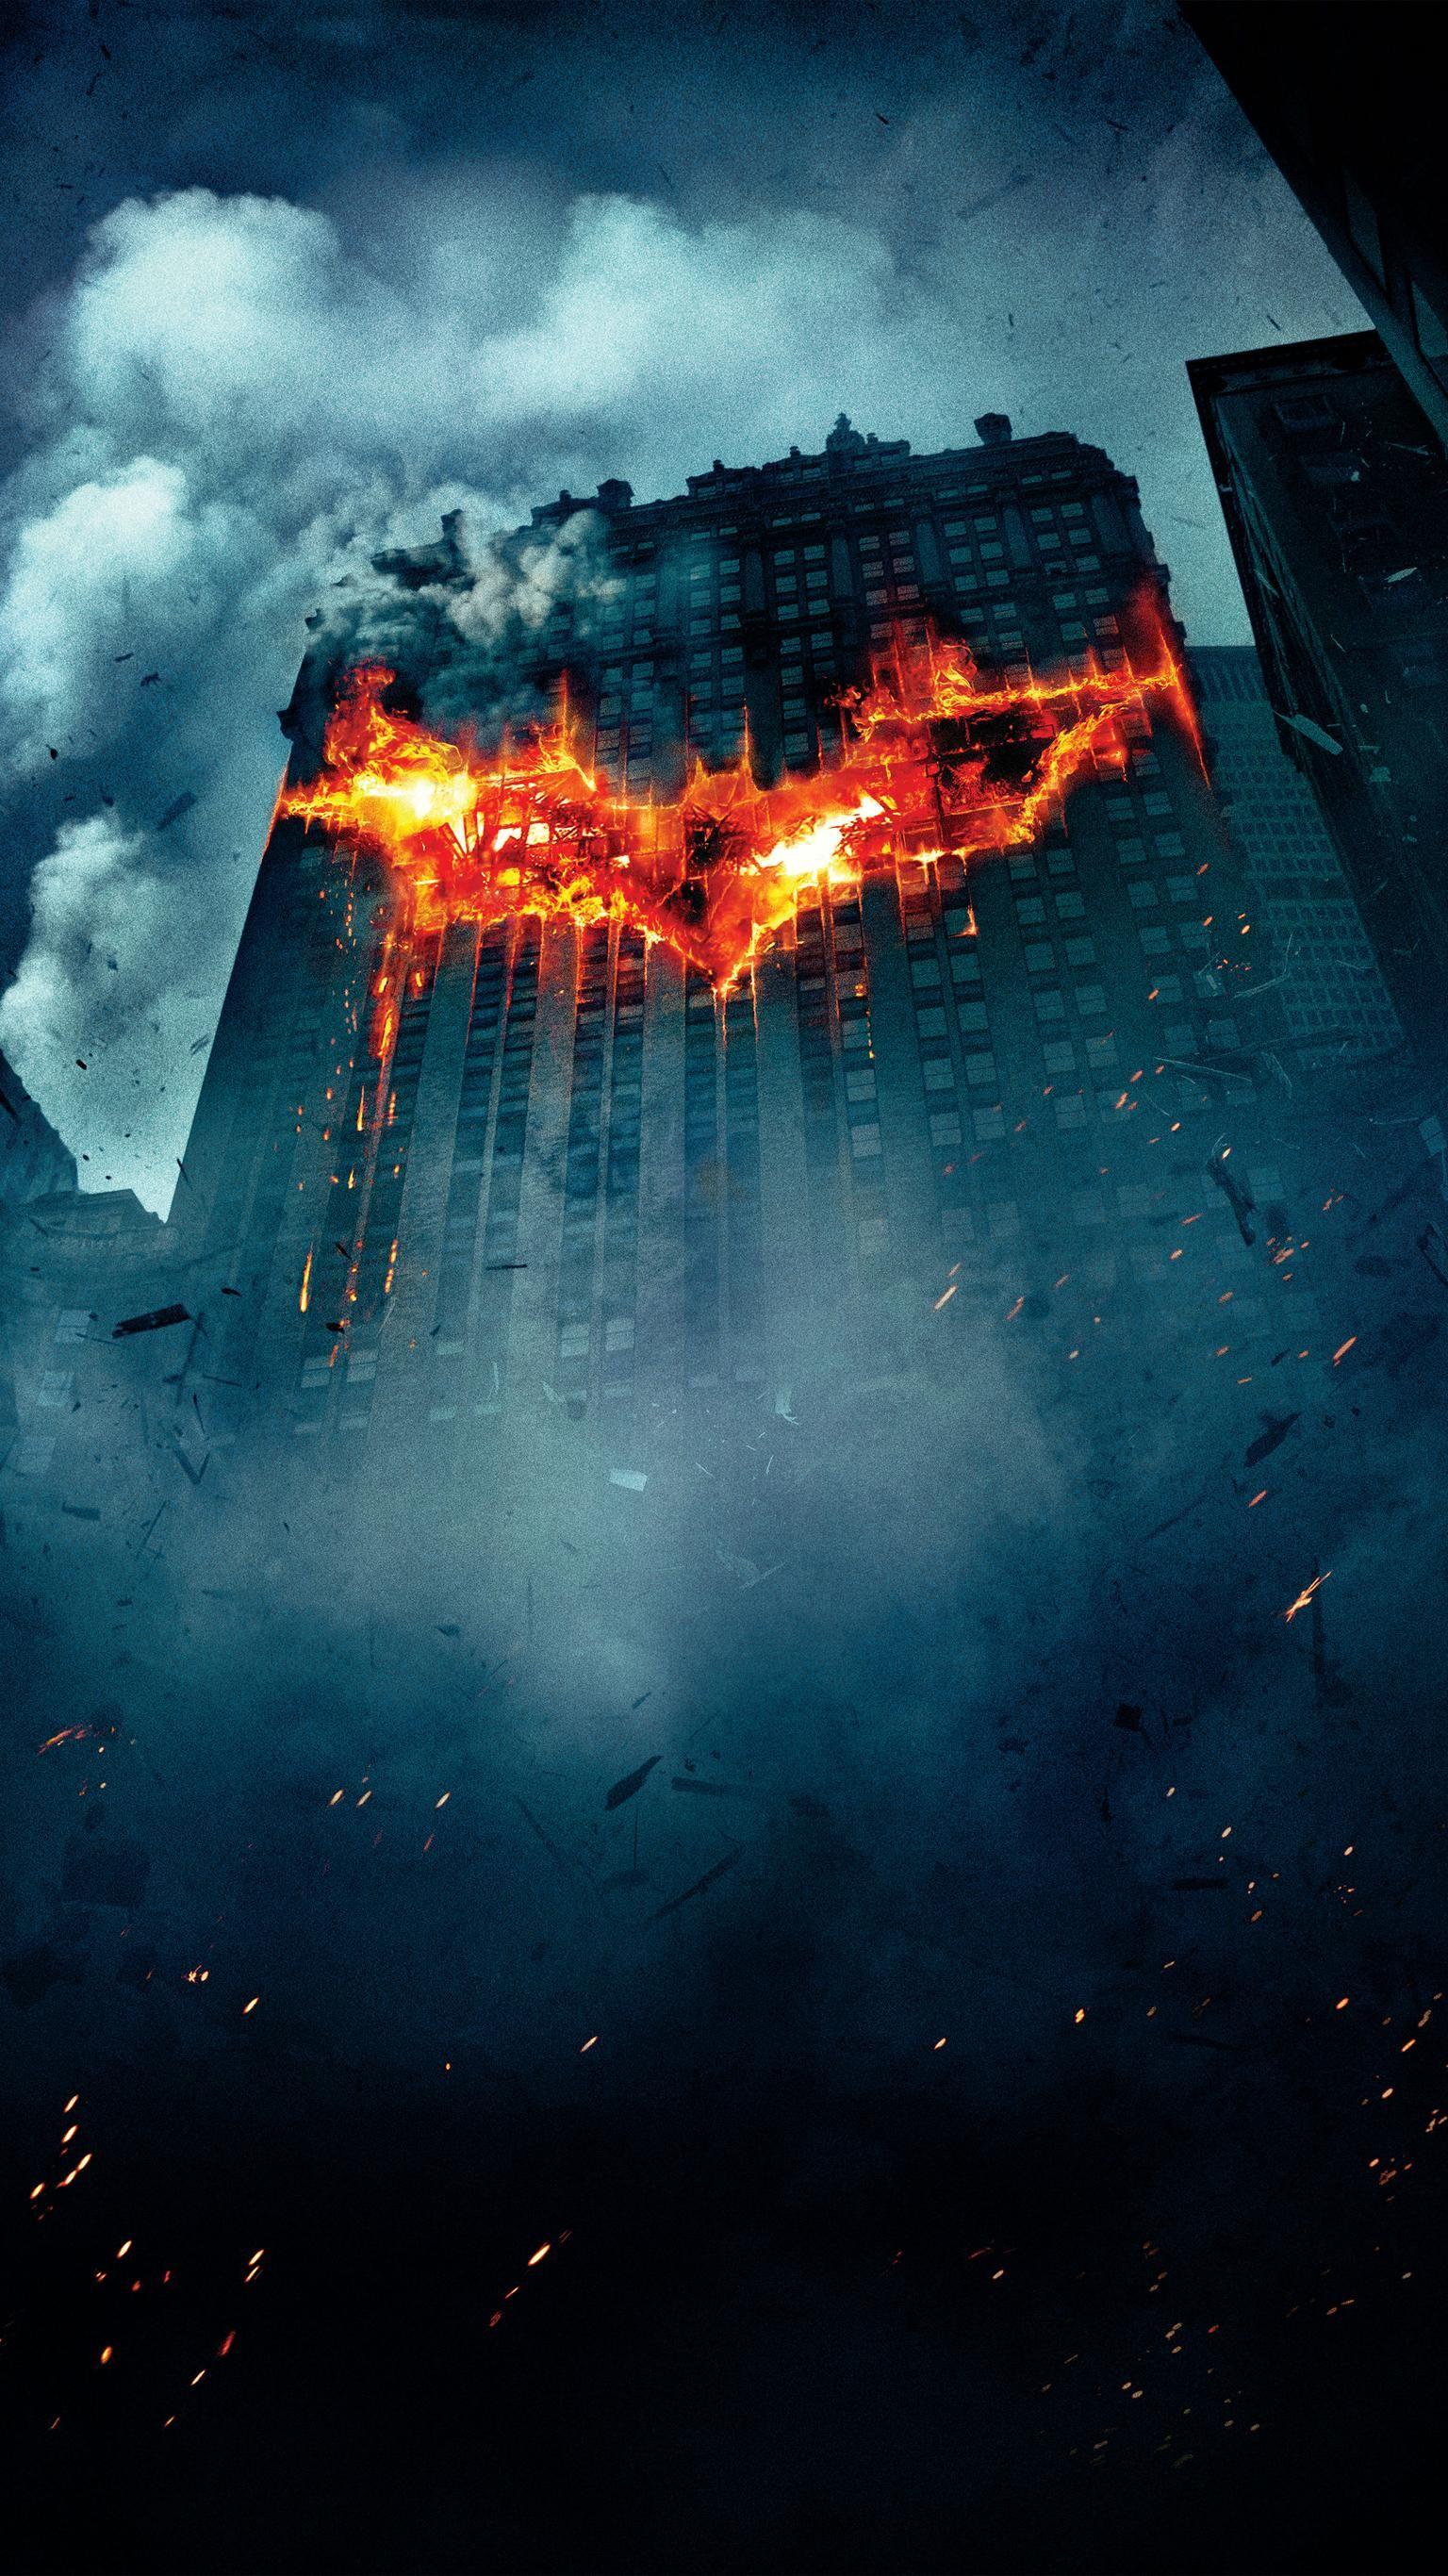 The Dark Knight (2008) Phone Wallpaper Dark knight